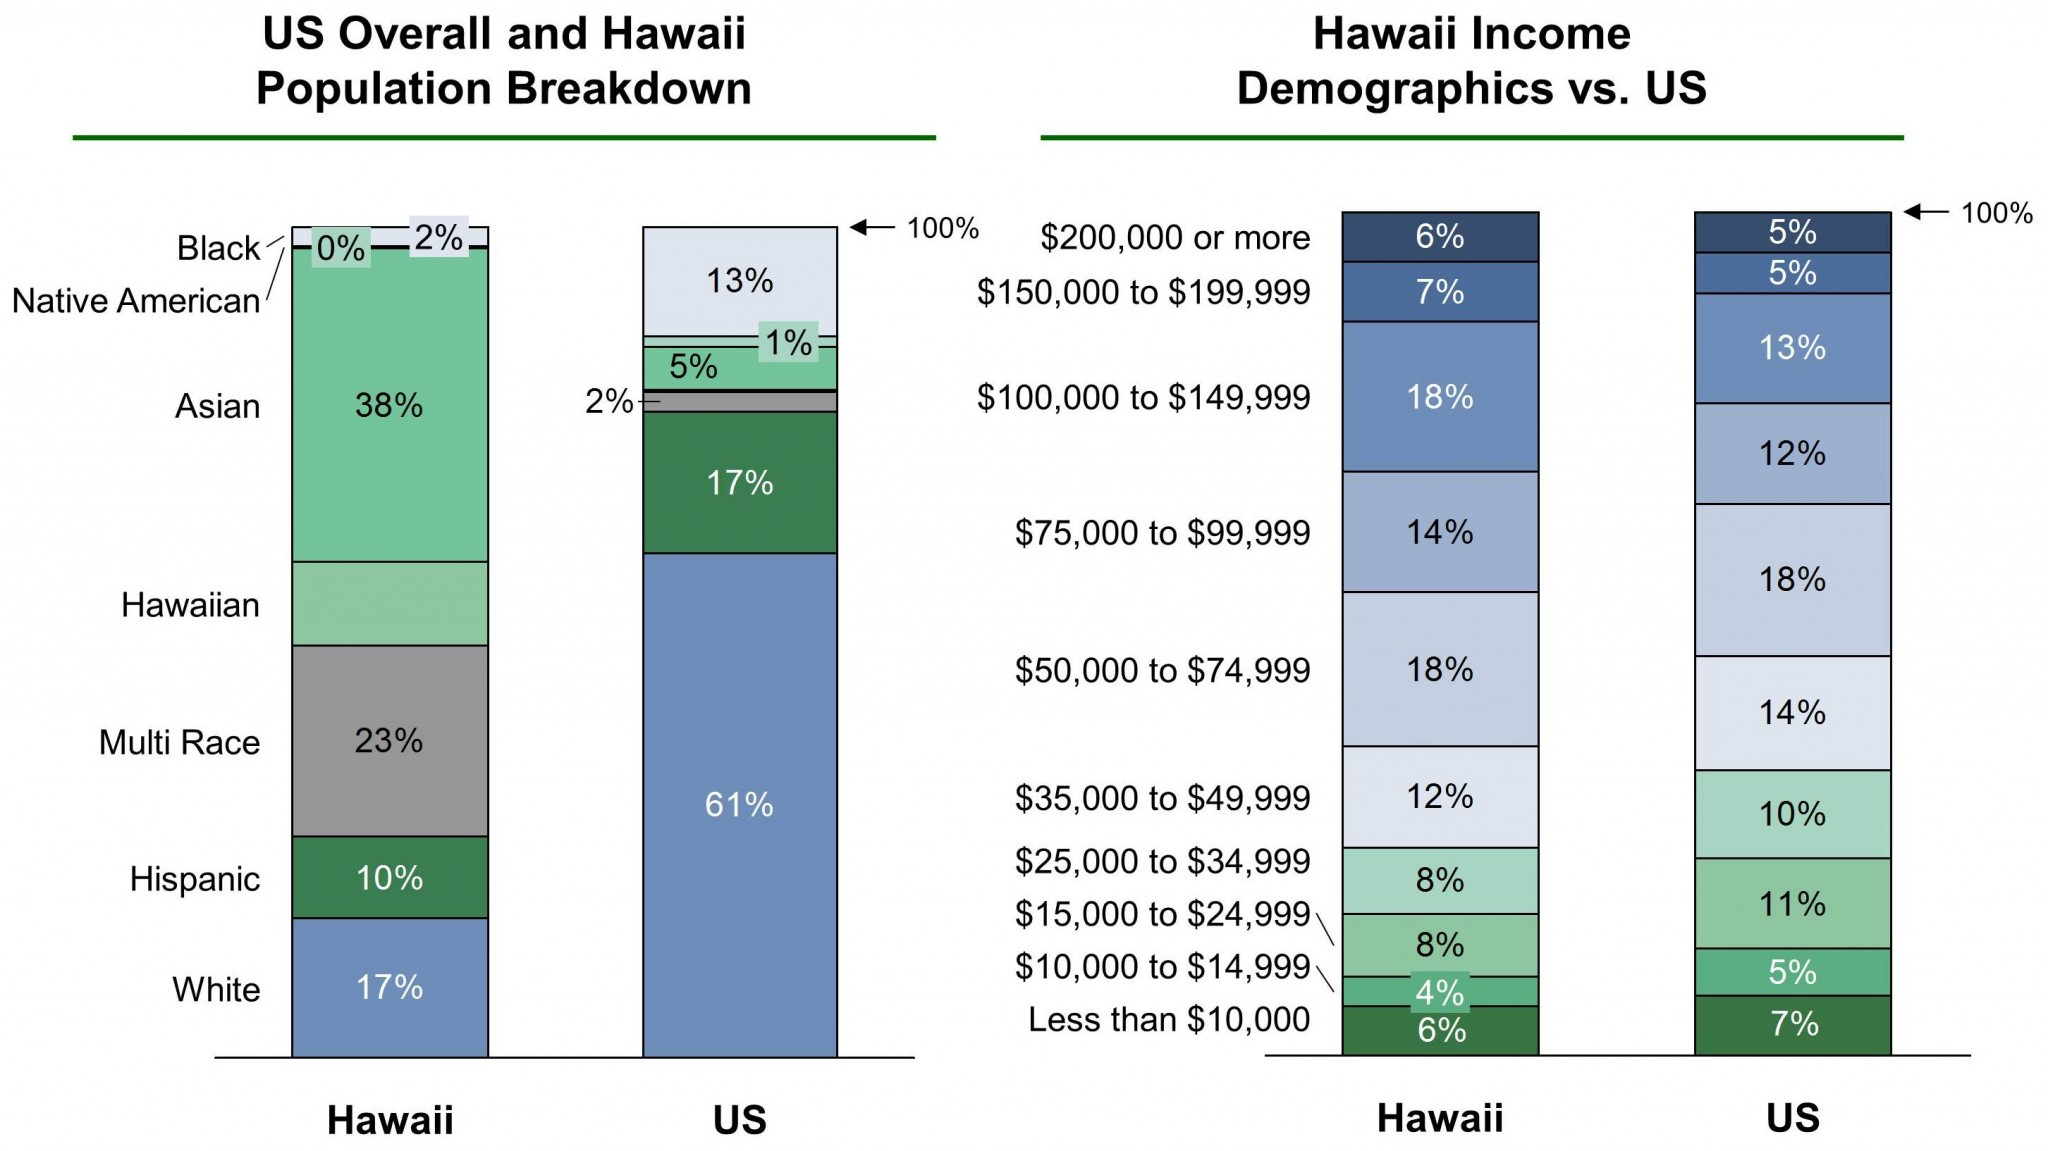 Hawaii EB-5 Regional Center Demographics VF